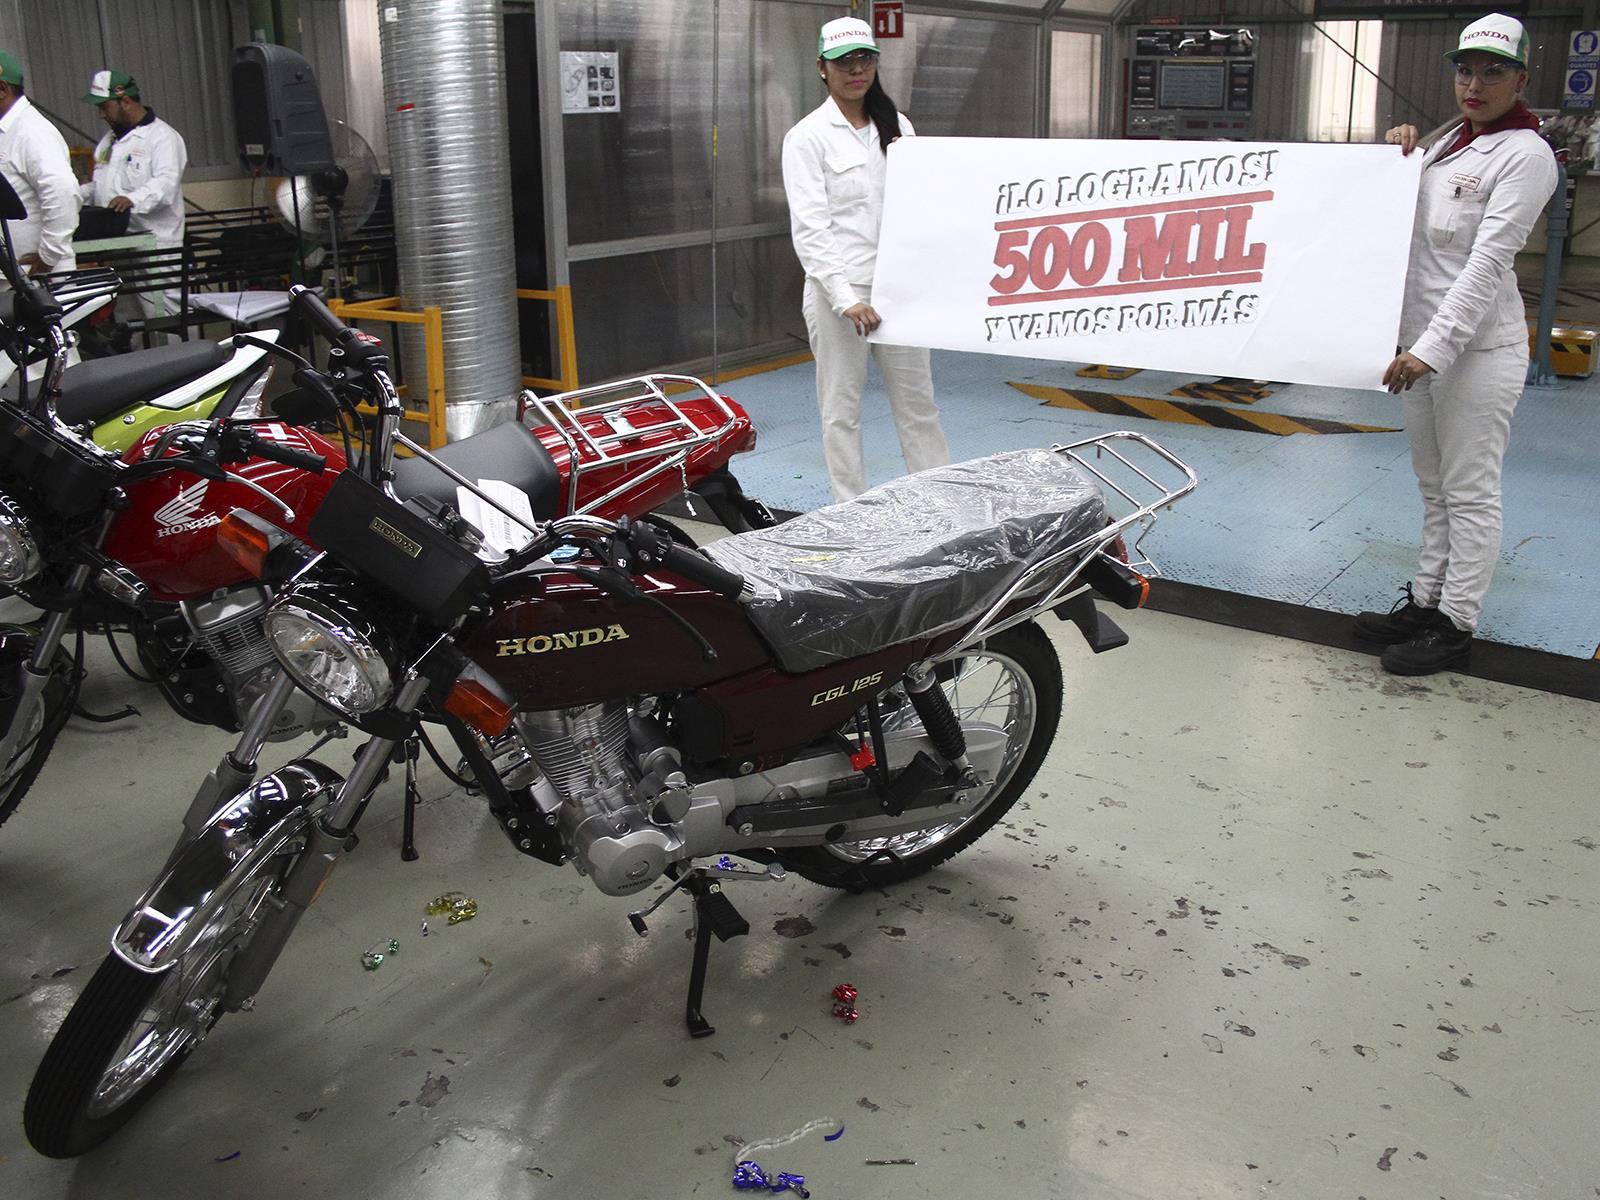 honda llega a las 500 000 motos producidas en m xico. Black Bedroom Furniture Sets. Home Design Ideas